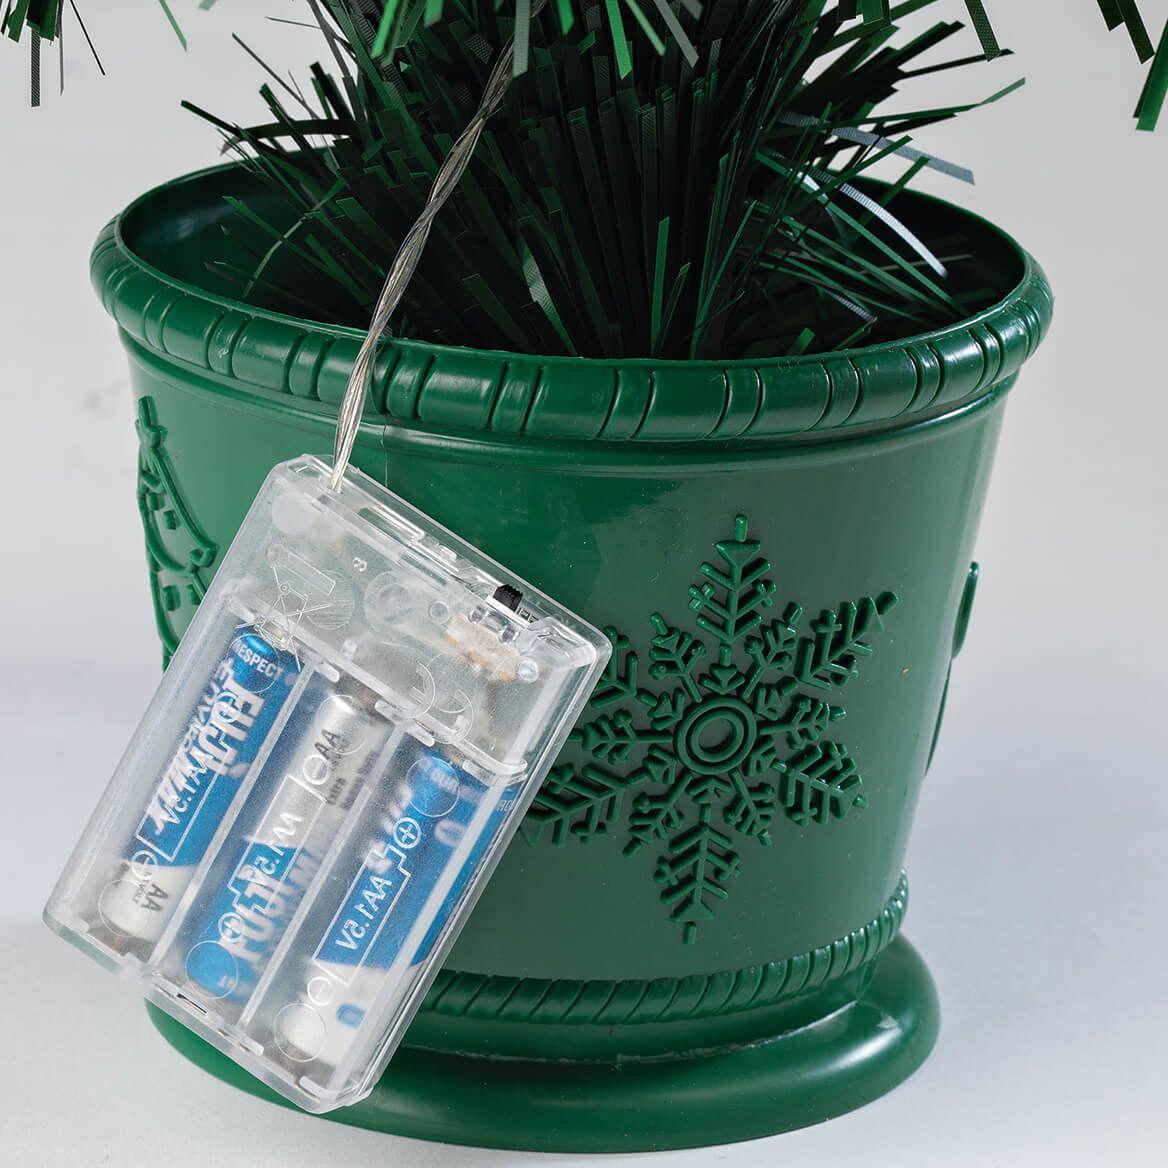 2-Foot Battery-Operated Fiber Optic Tree-372291